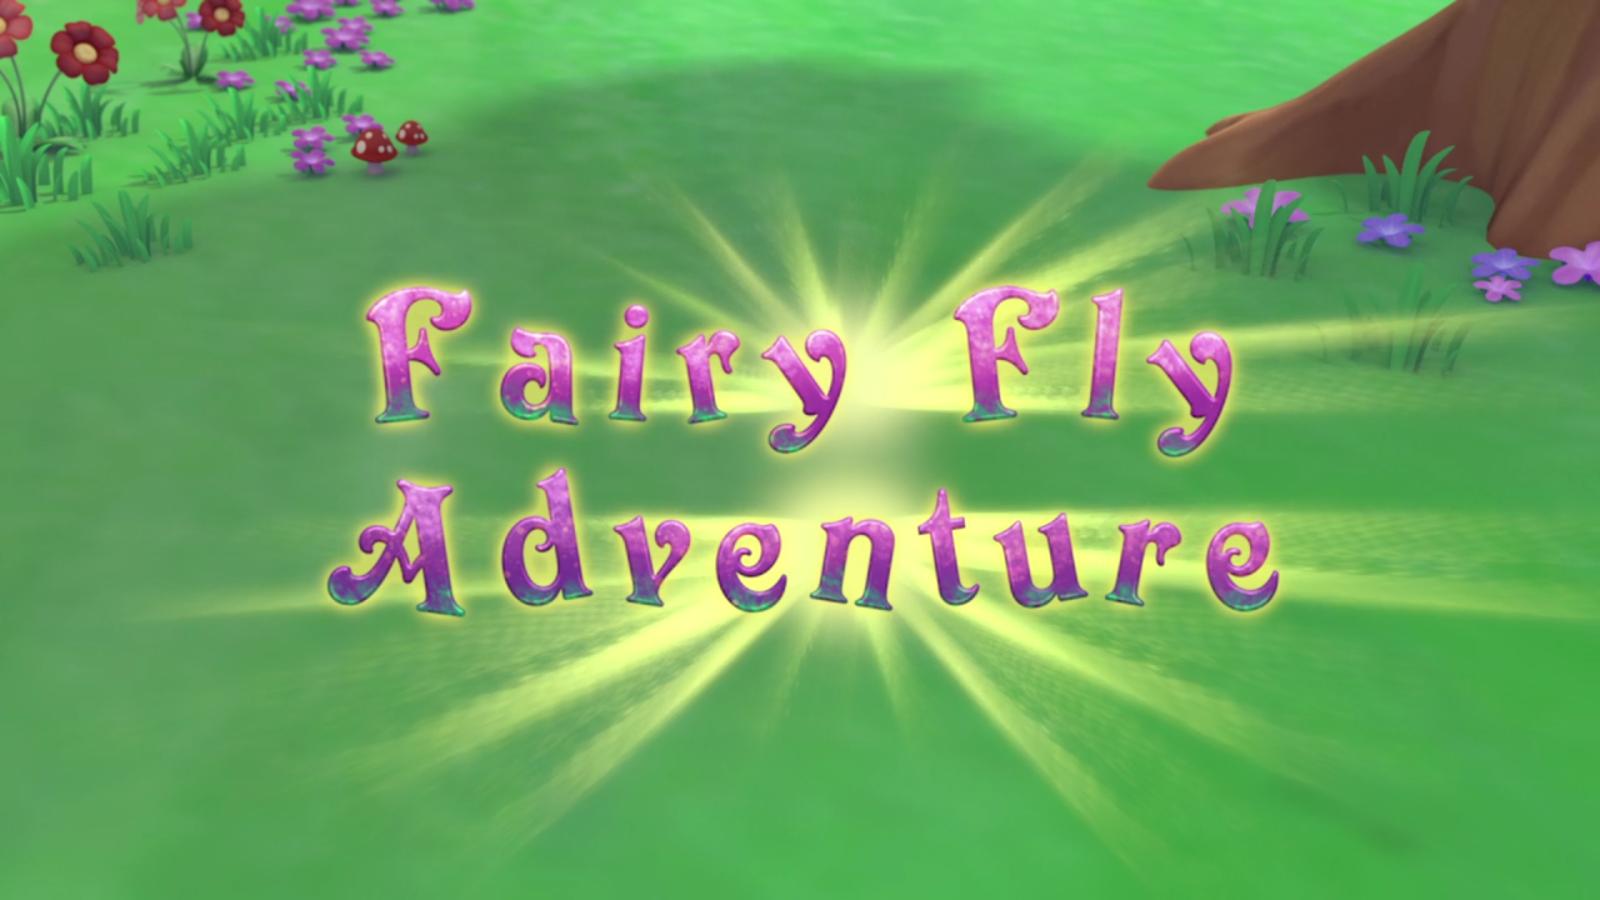 Fairy Fly Adventure